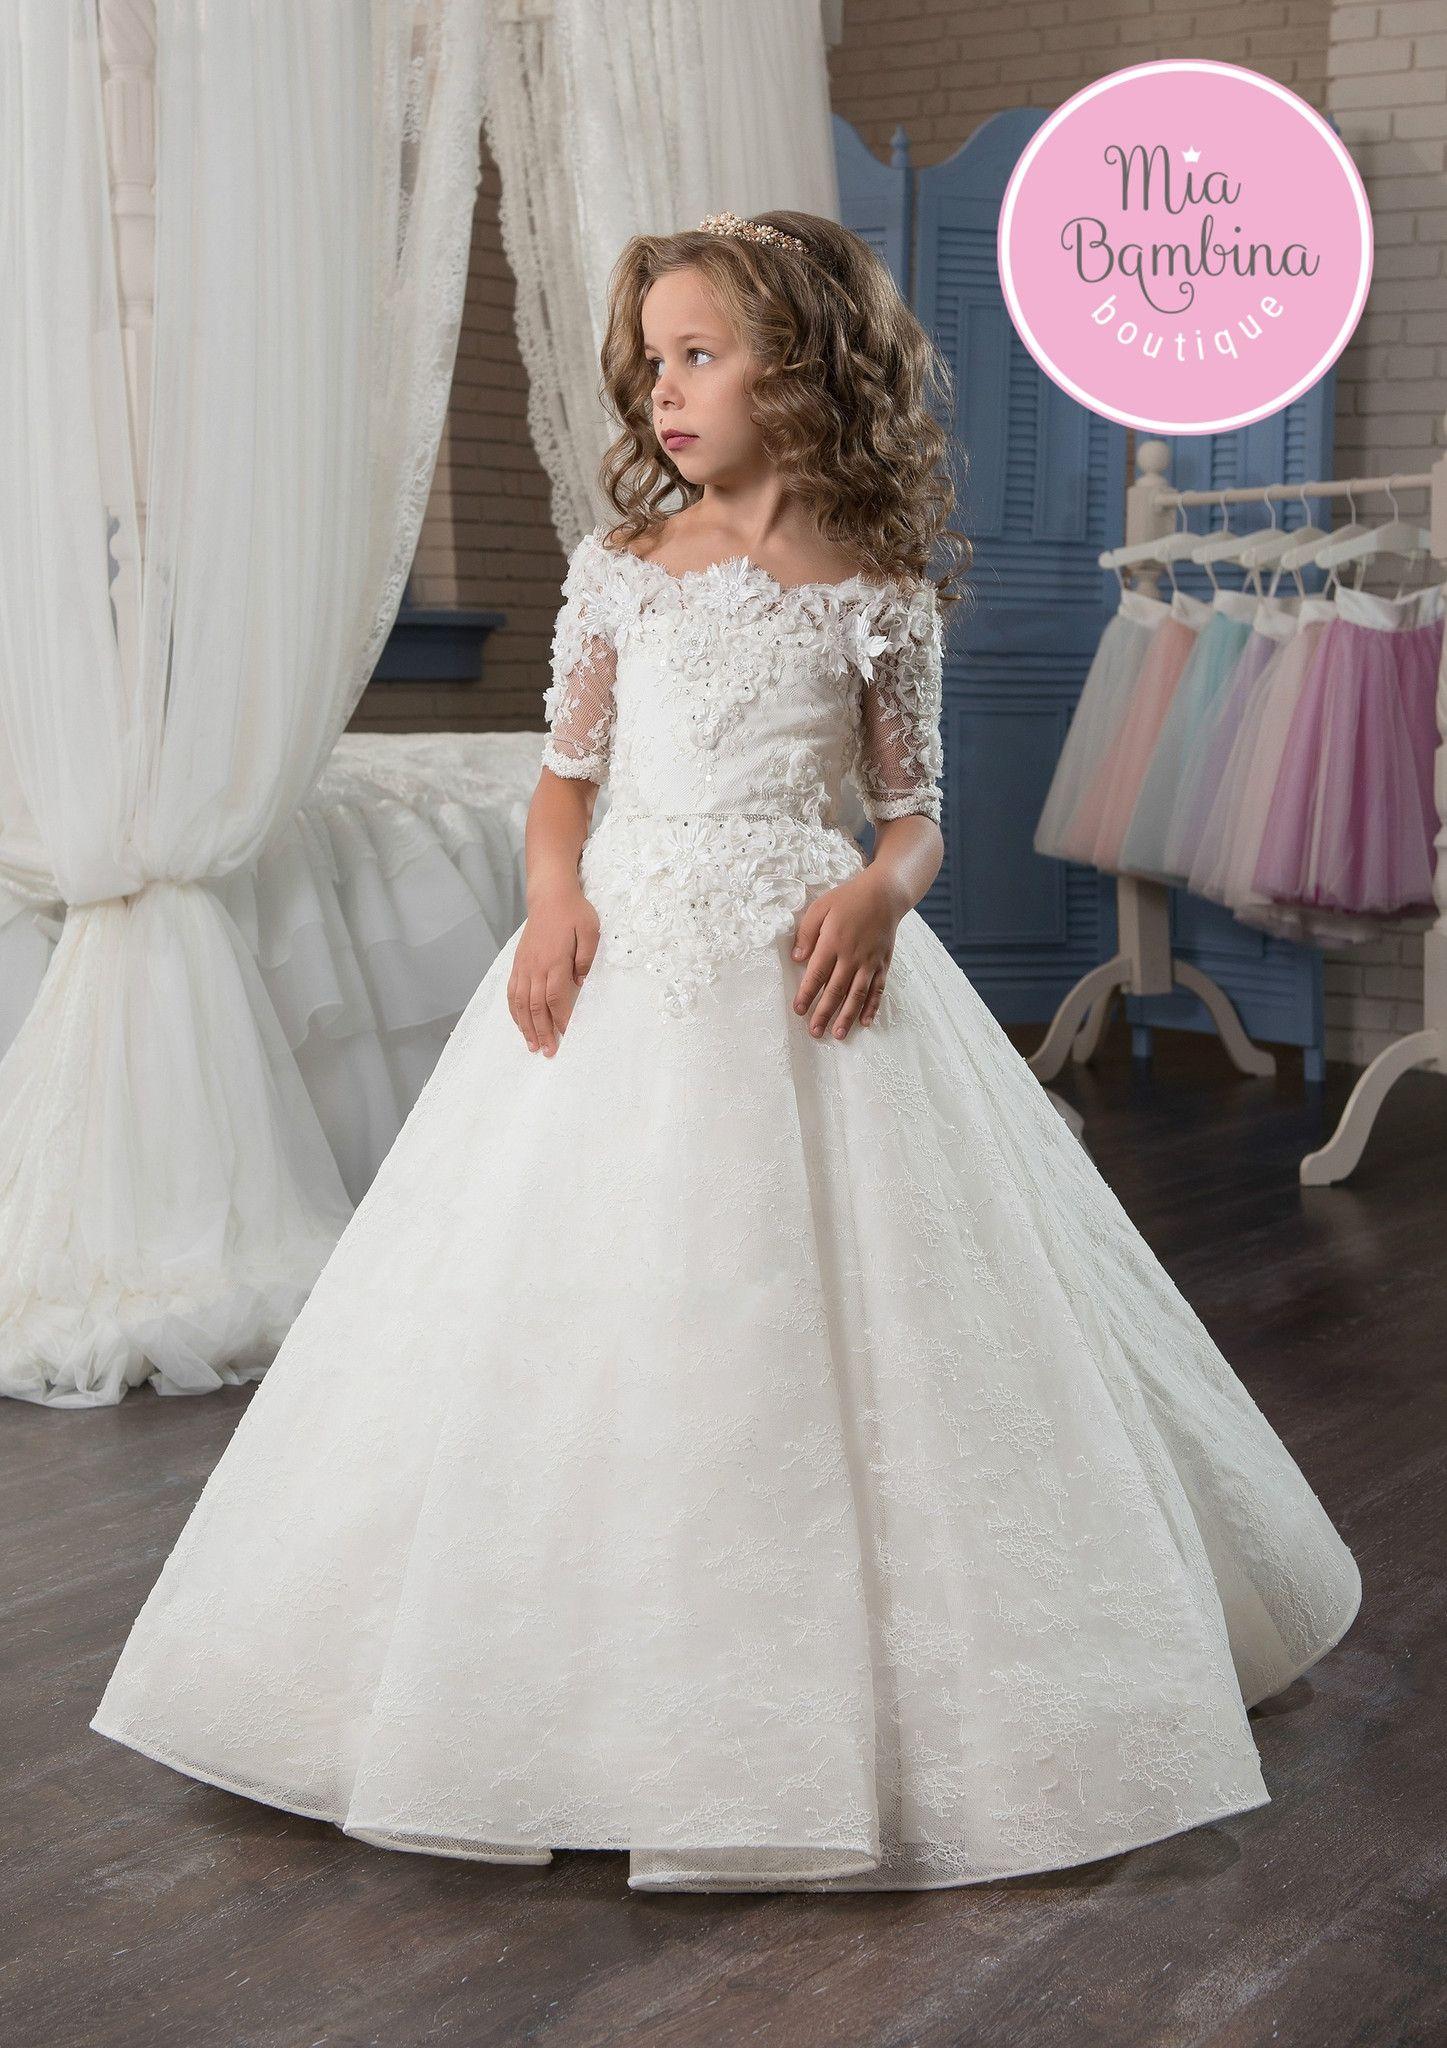 Covered shoulder wedding dresses  Wichita  vestidos damas  Pinterest  Fabric covered button Fabric